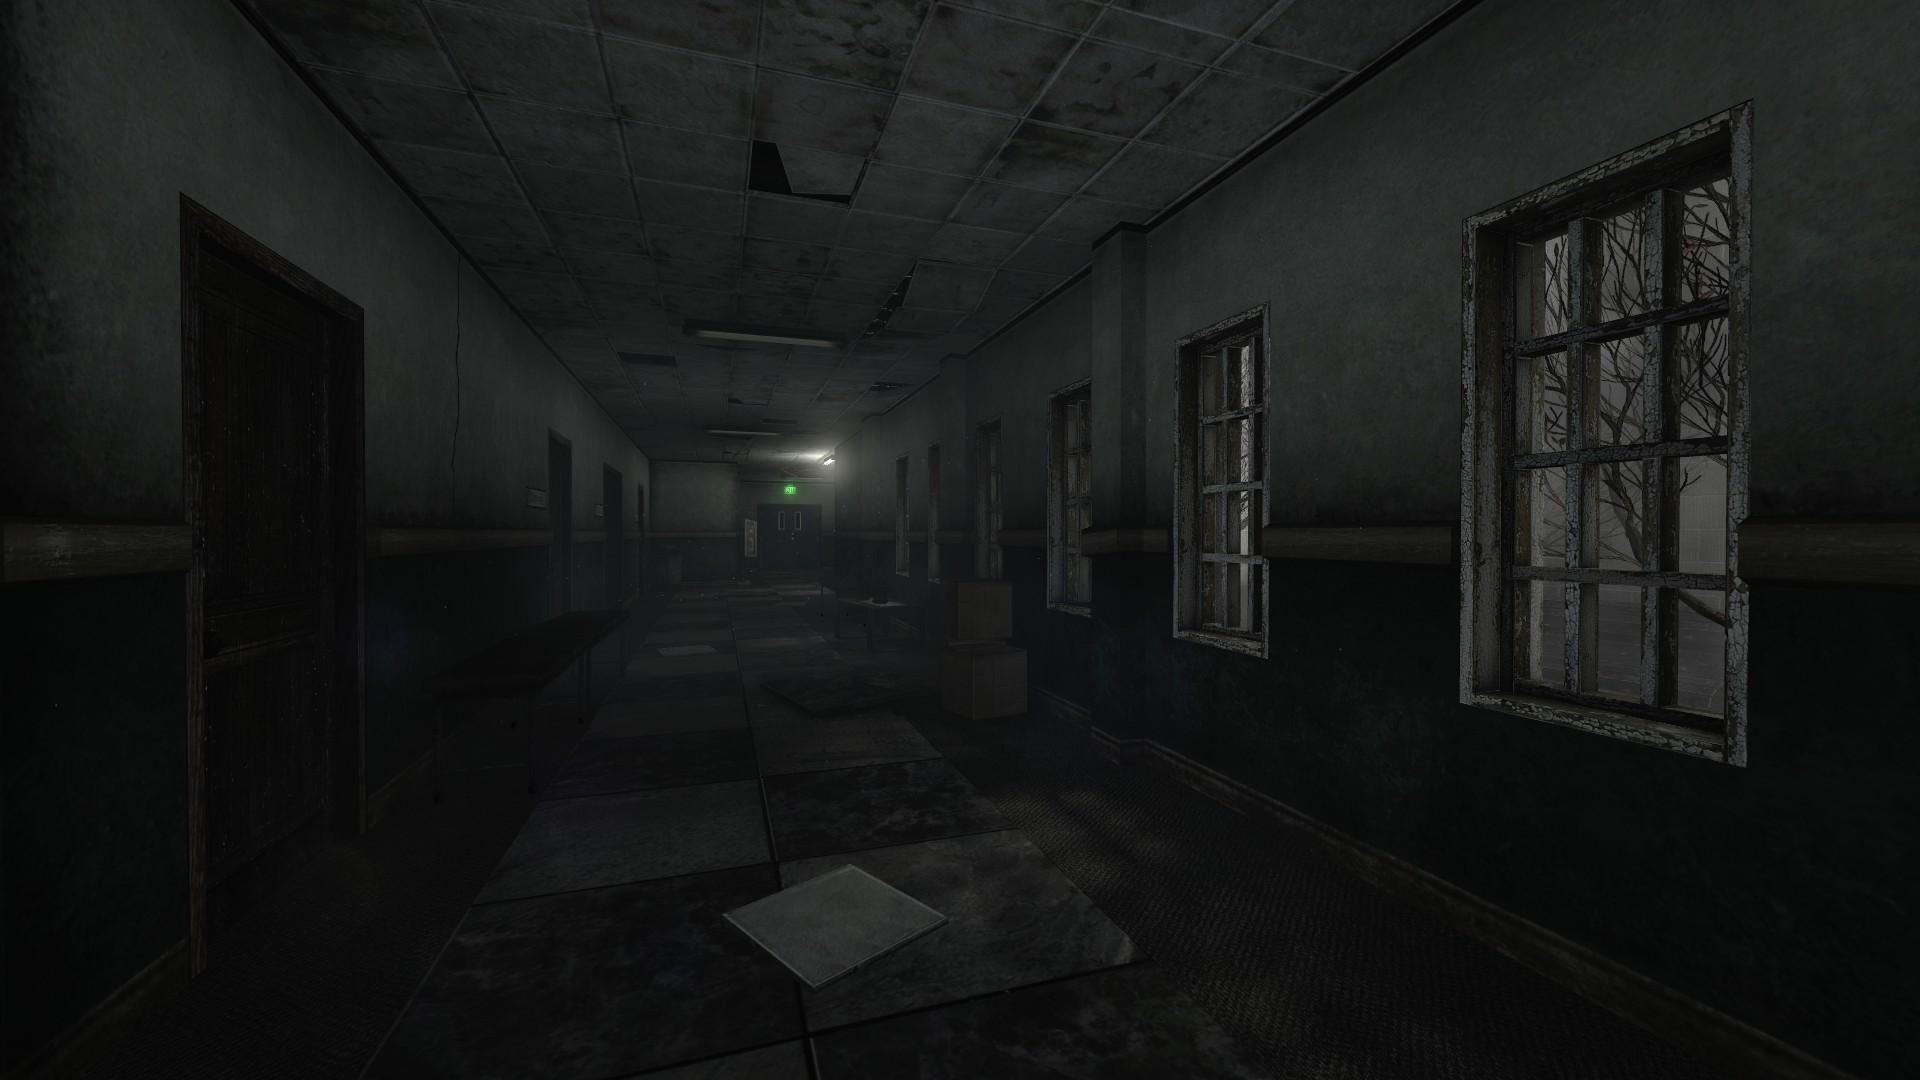 Modifikace Alchemilla do Half-Life 2 pro fanoušky Silent Hillu 104703